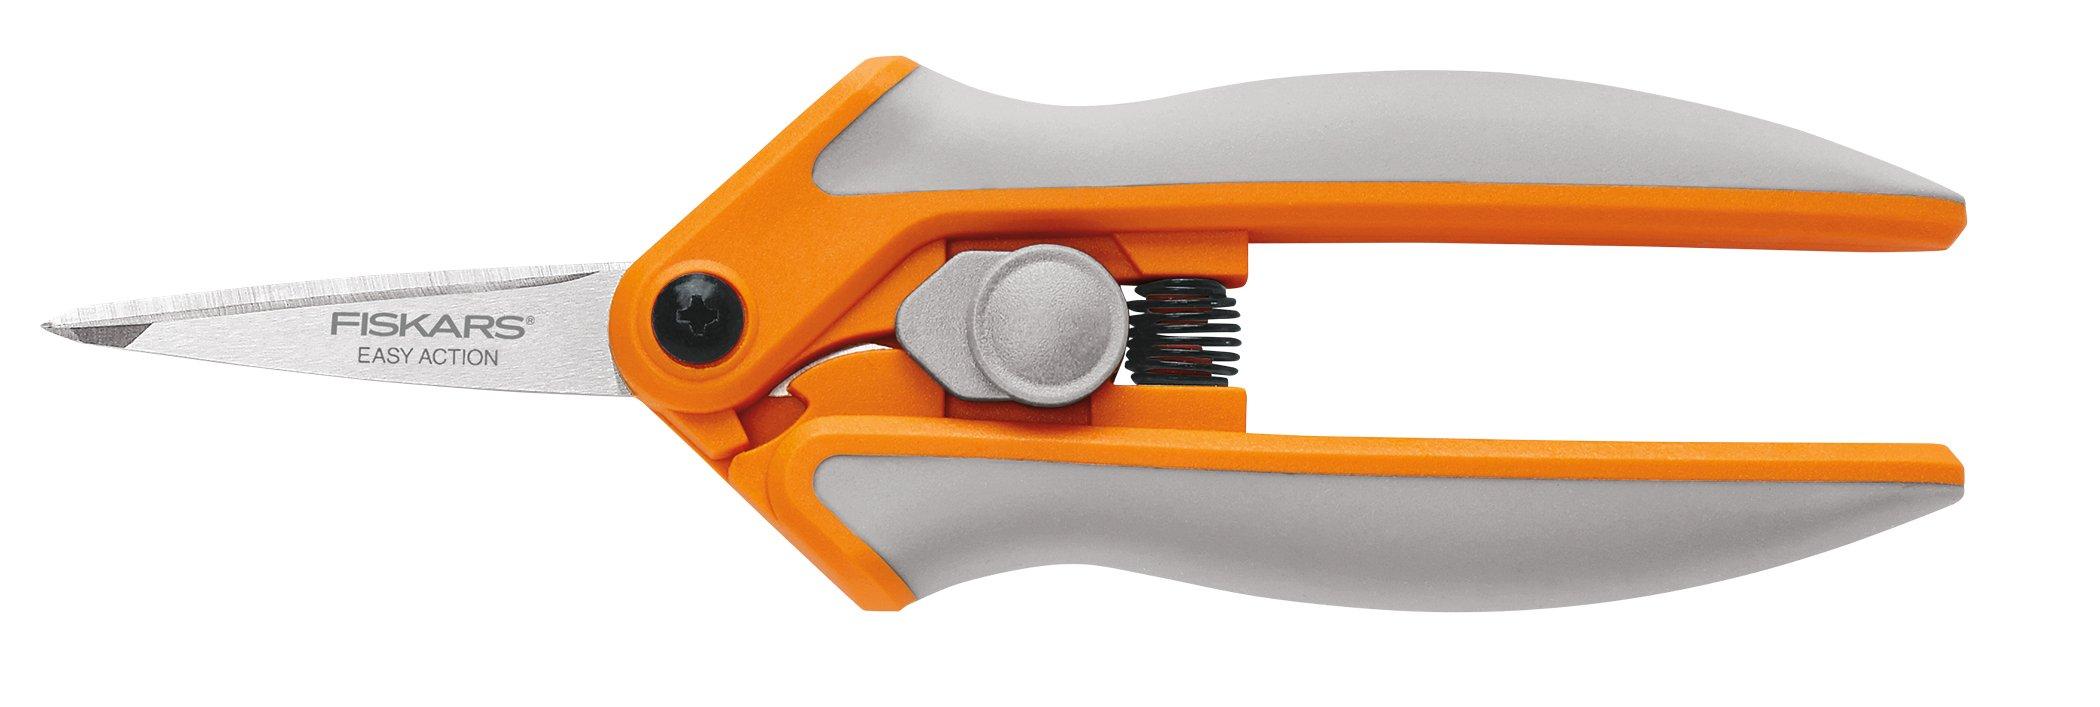 Tijera : Fiskars 190500 Razoredge Micro Corte 13cm